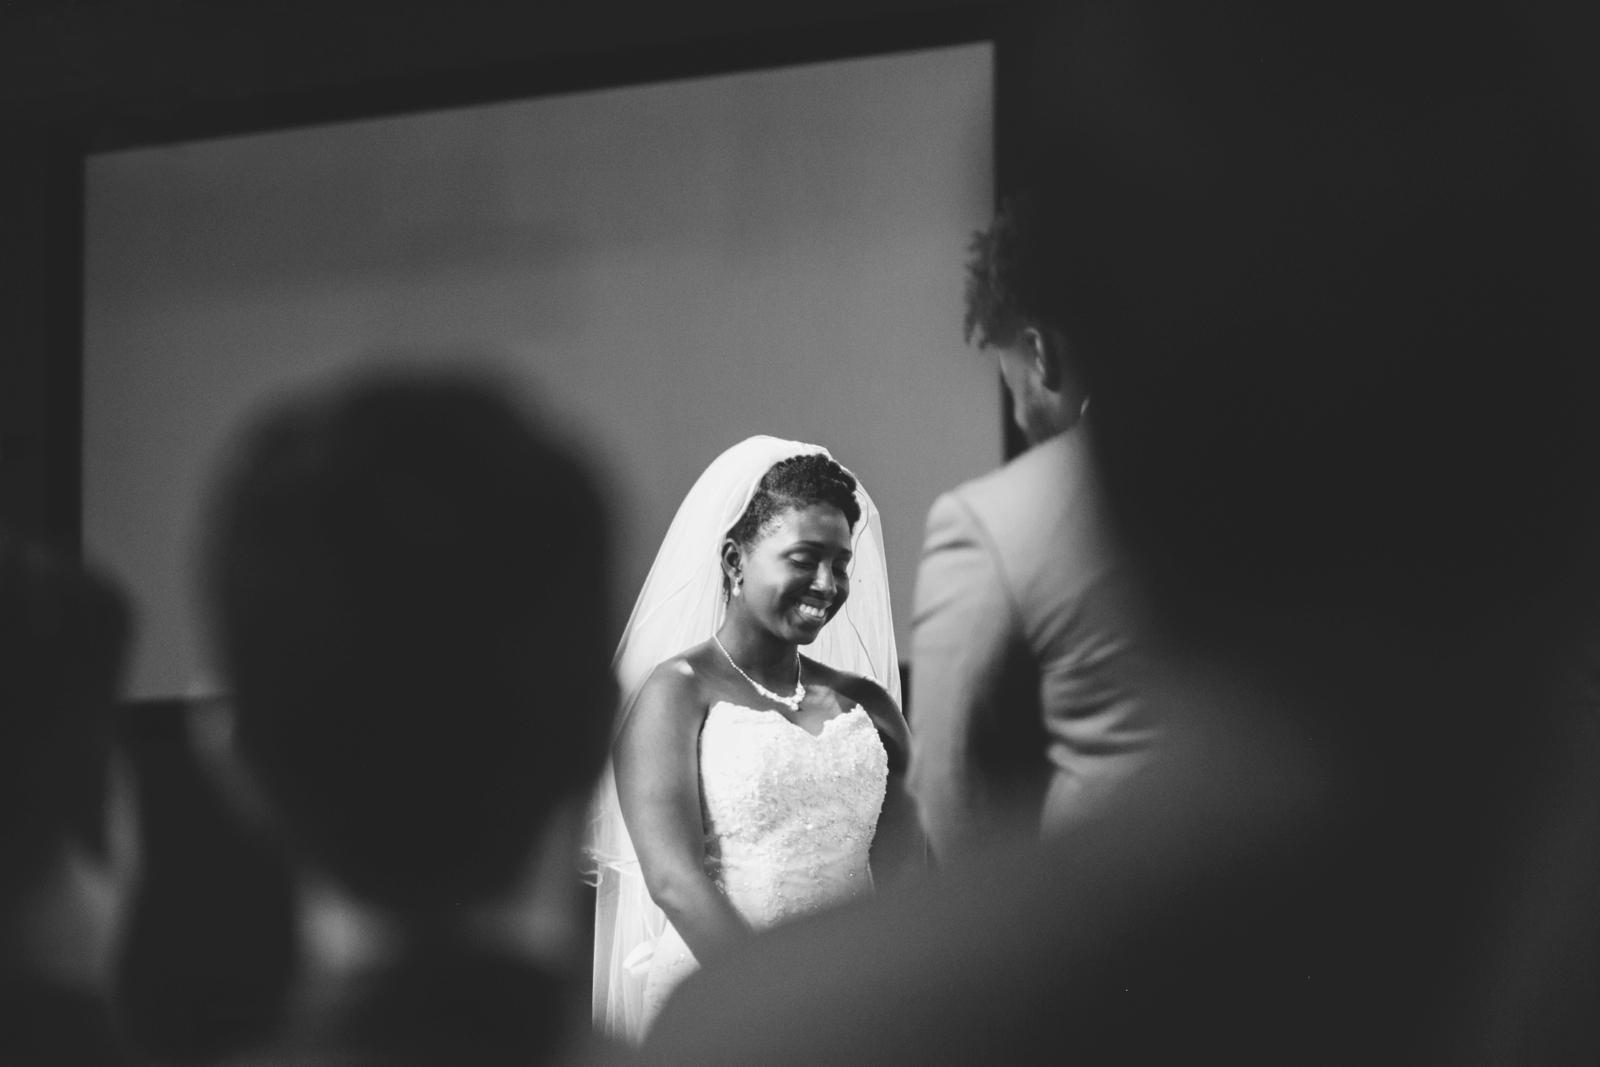 Bailey-Q-Photo-New-York-Wedding-007.jpg